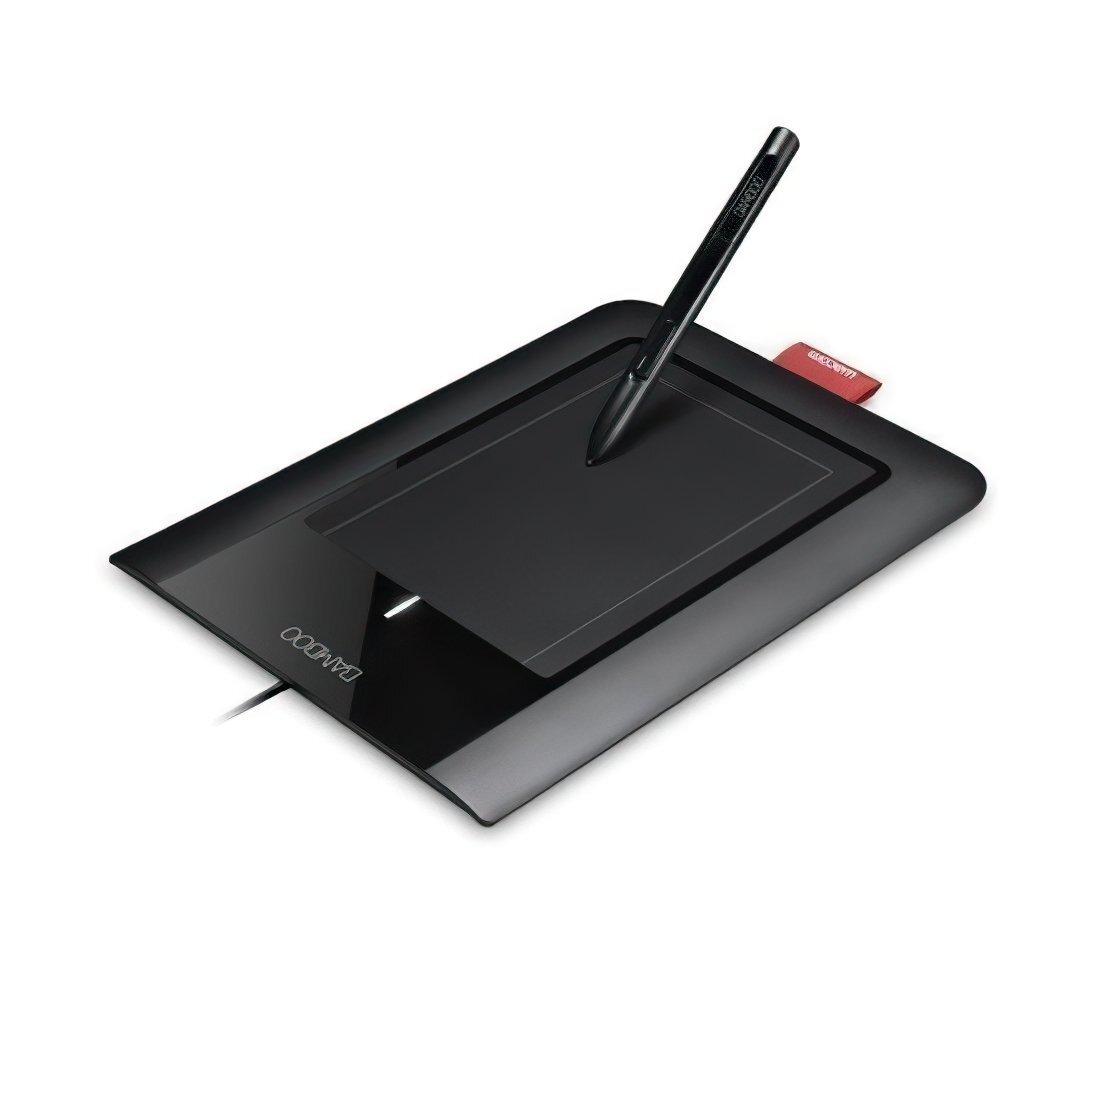 Графічний планшет Wacom Bamboo Pen_ фото